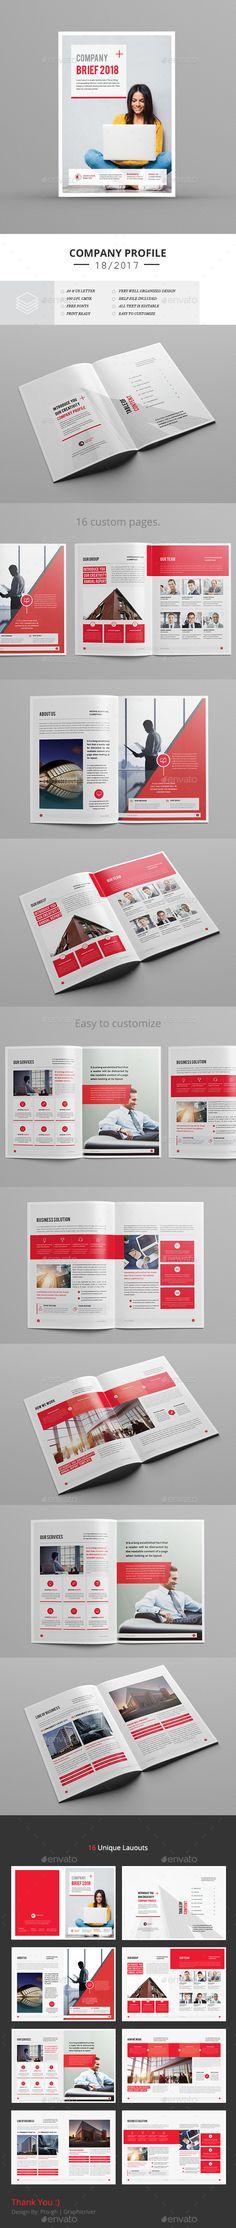 Creative Brief Template InDesign INDD